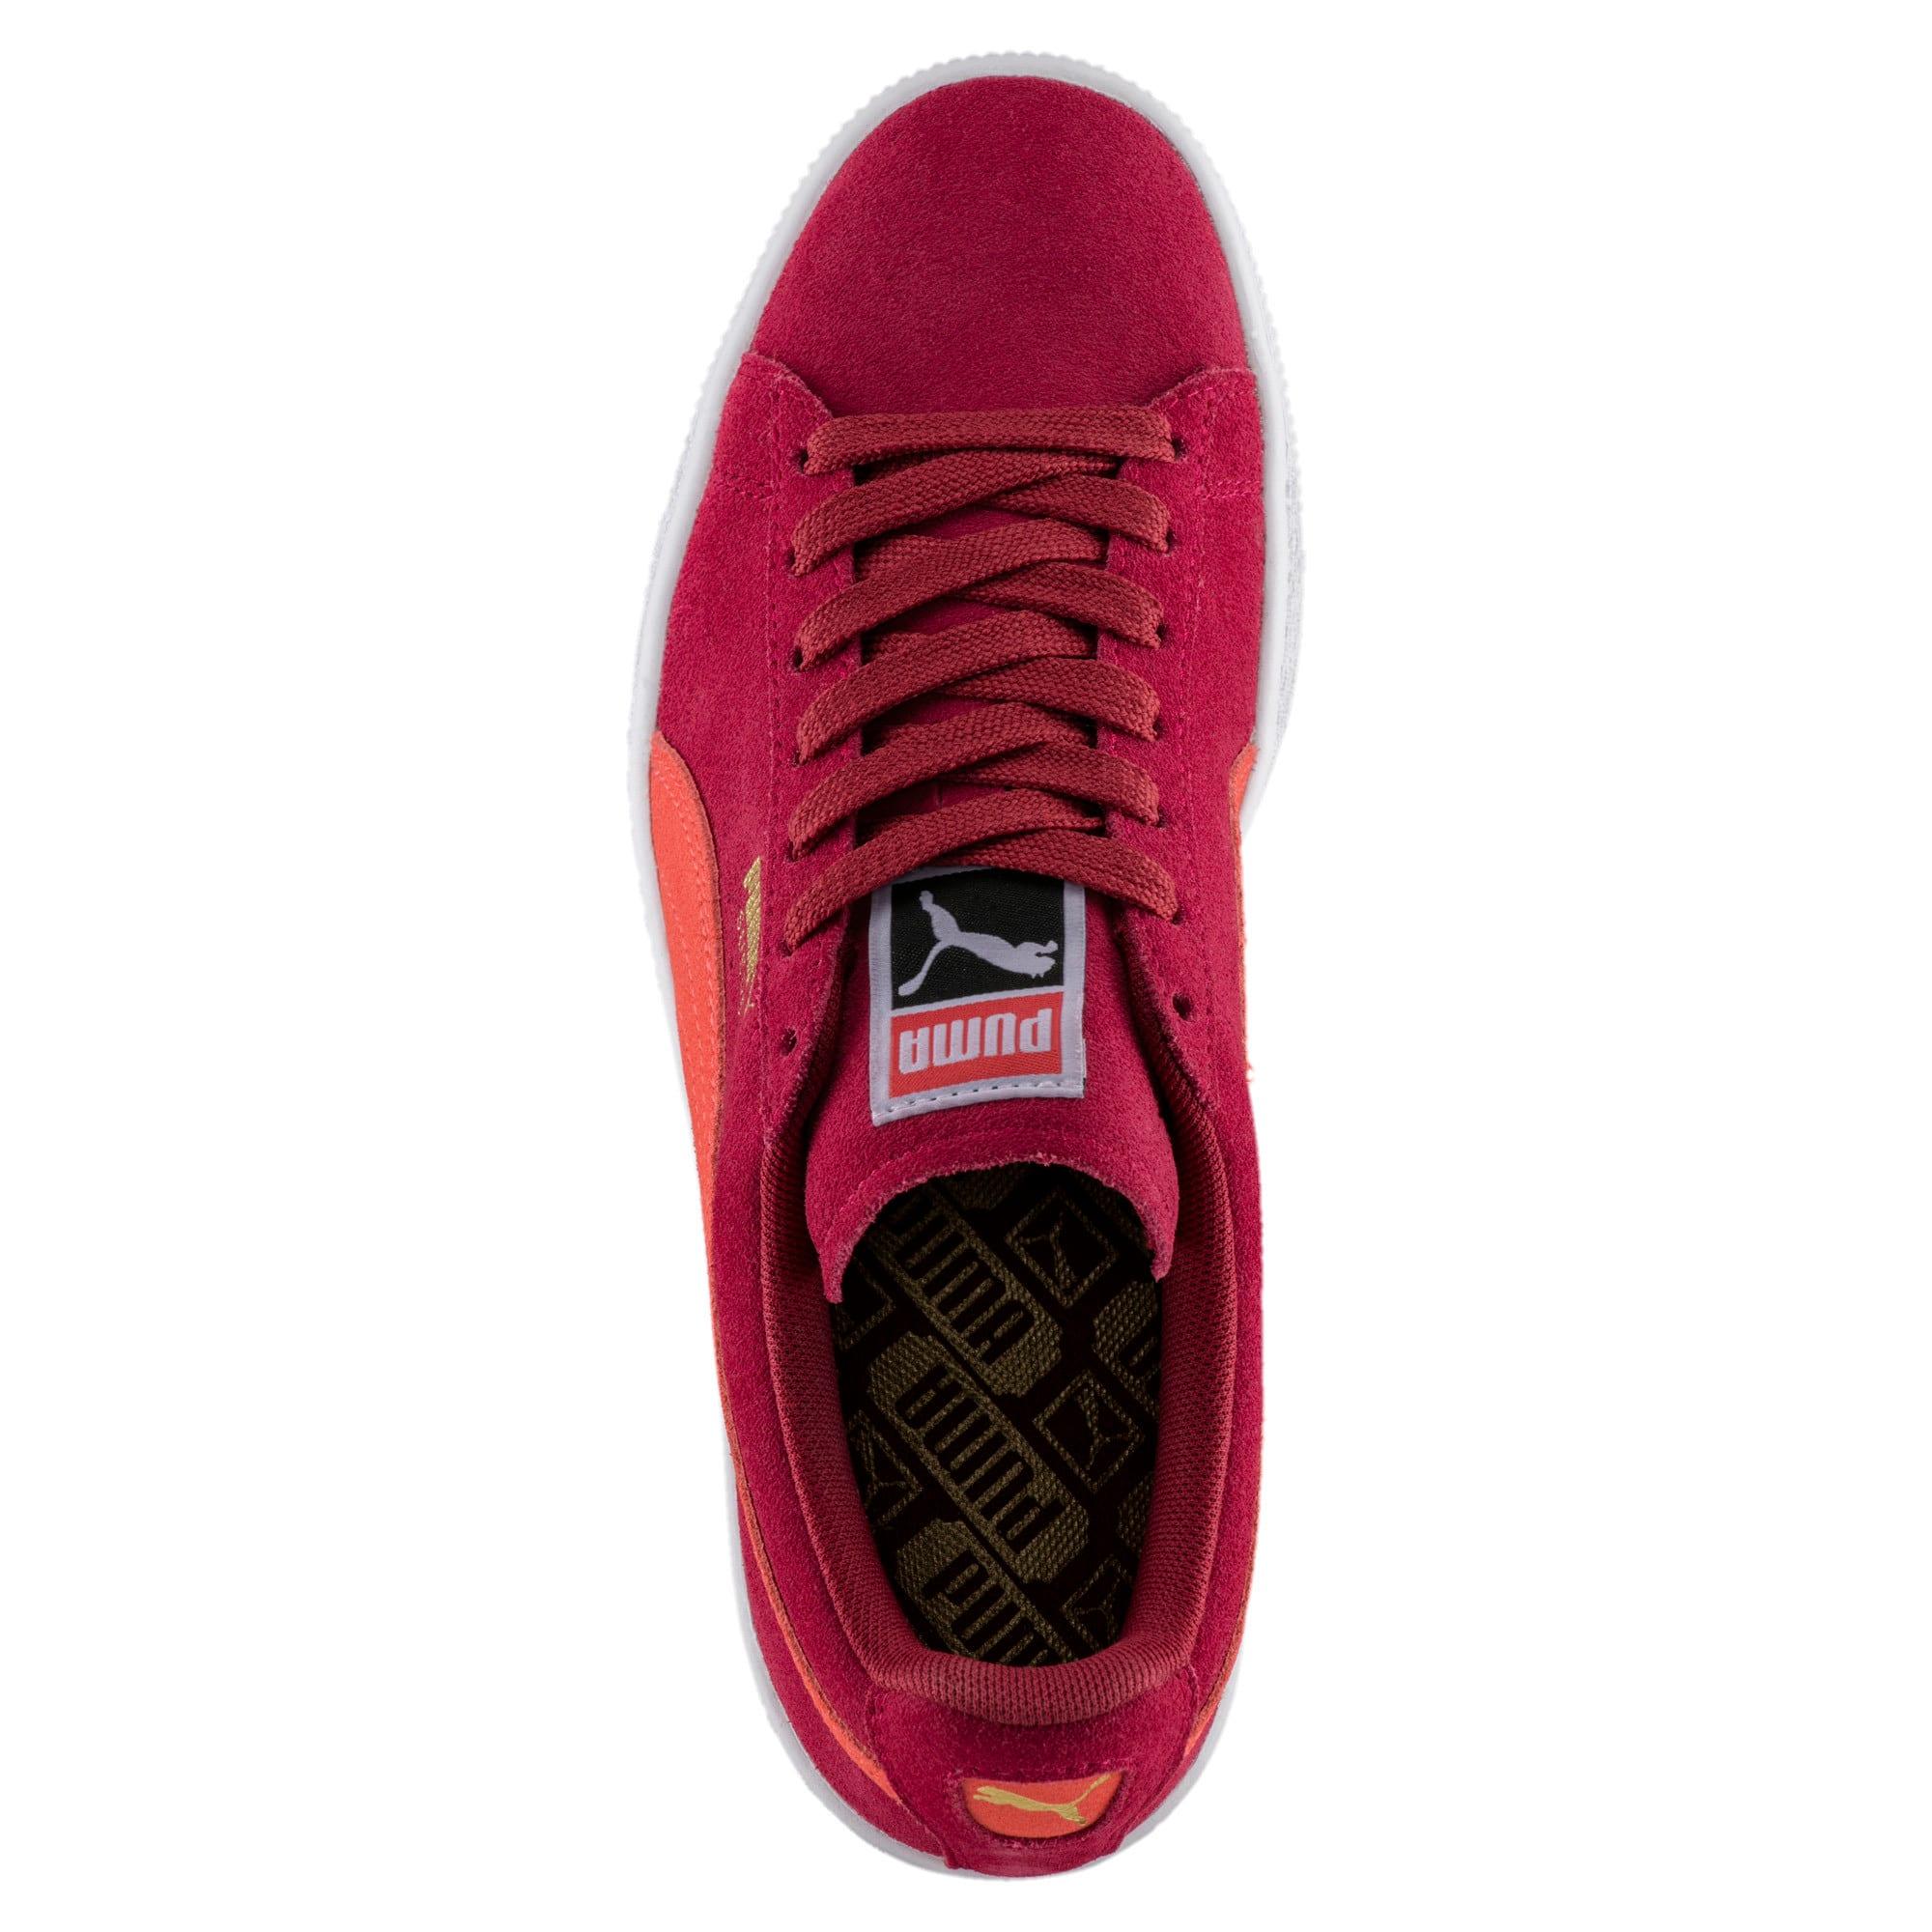 Thumbnail 5 of Suede Classic Women's Sneakers, Tibetan Red-Hot Coral, medium